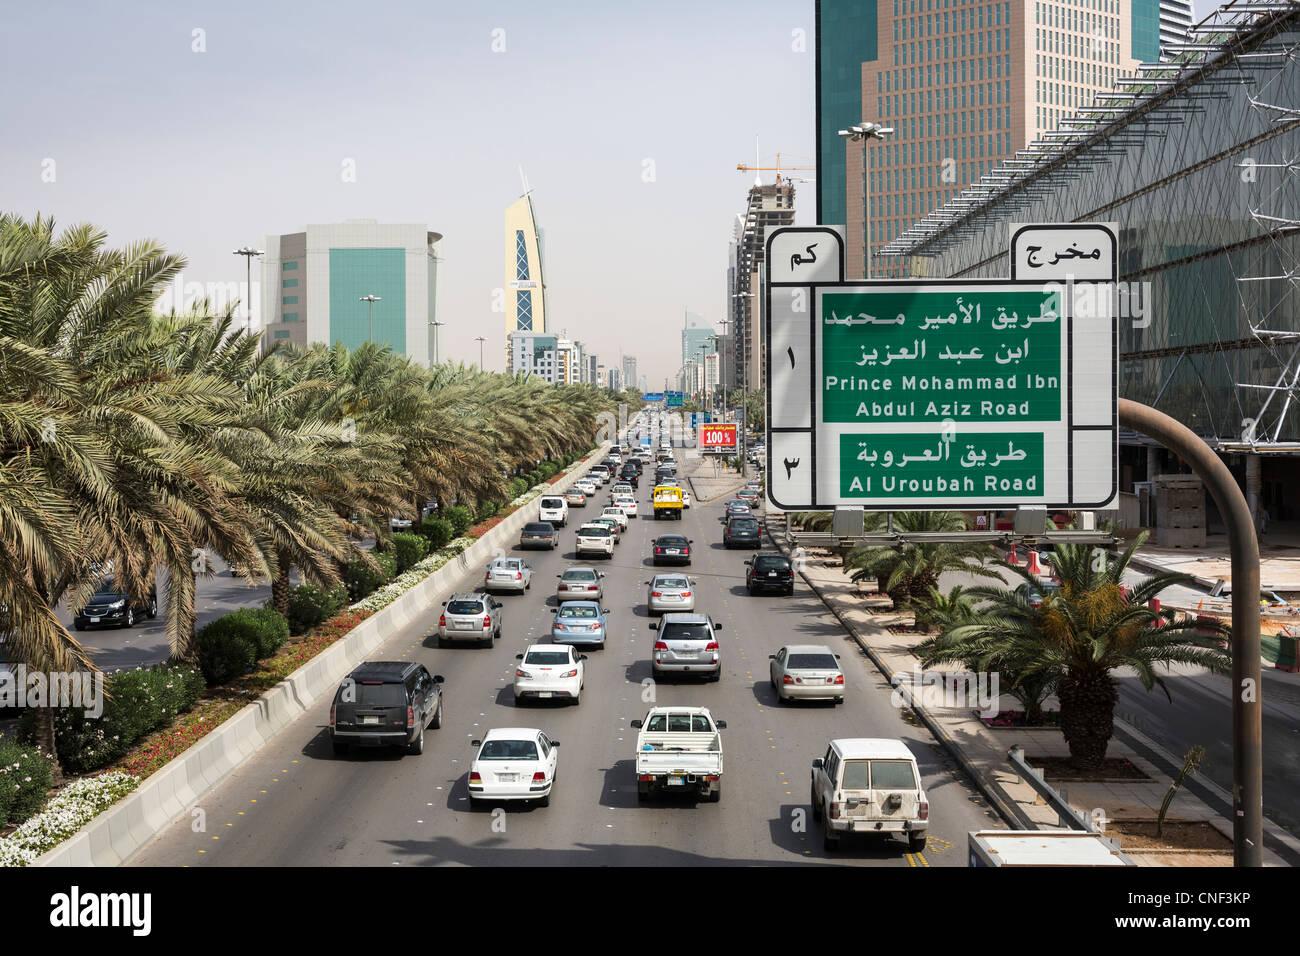 Tráfico en King Fahd Road, Riyadh, Arabia Saudita Imagen De Stock